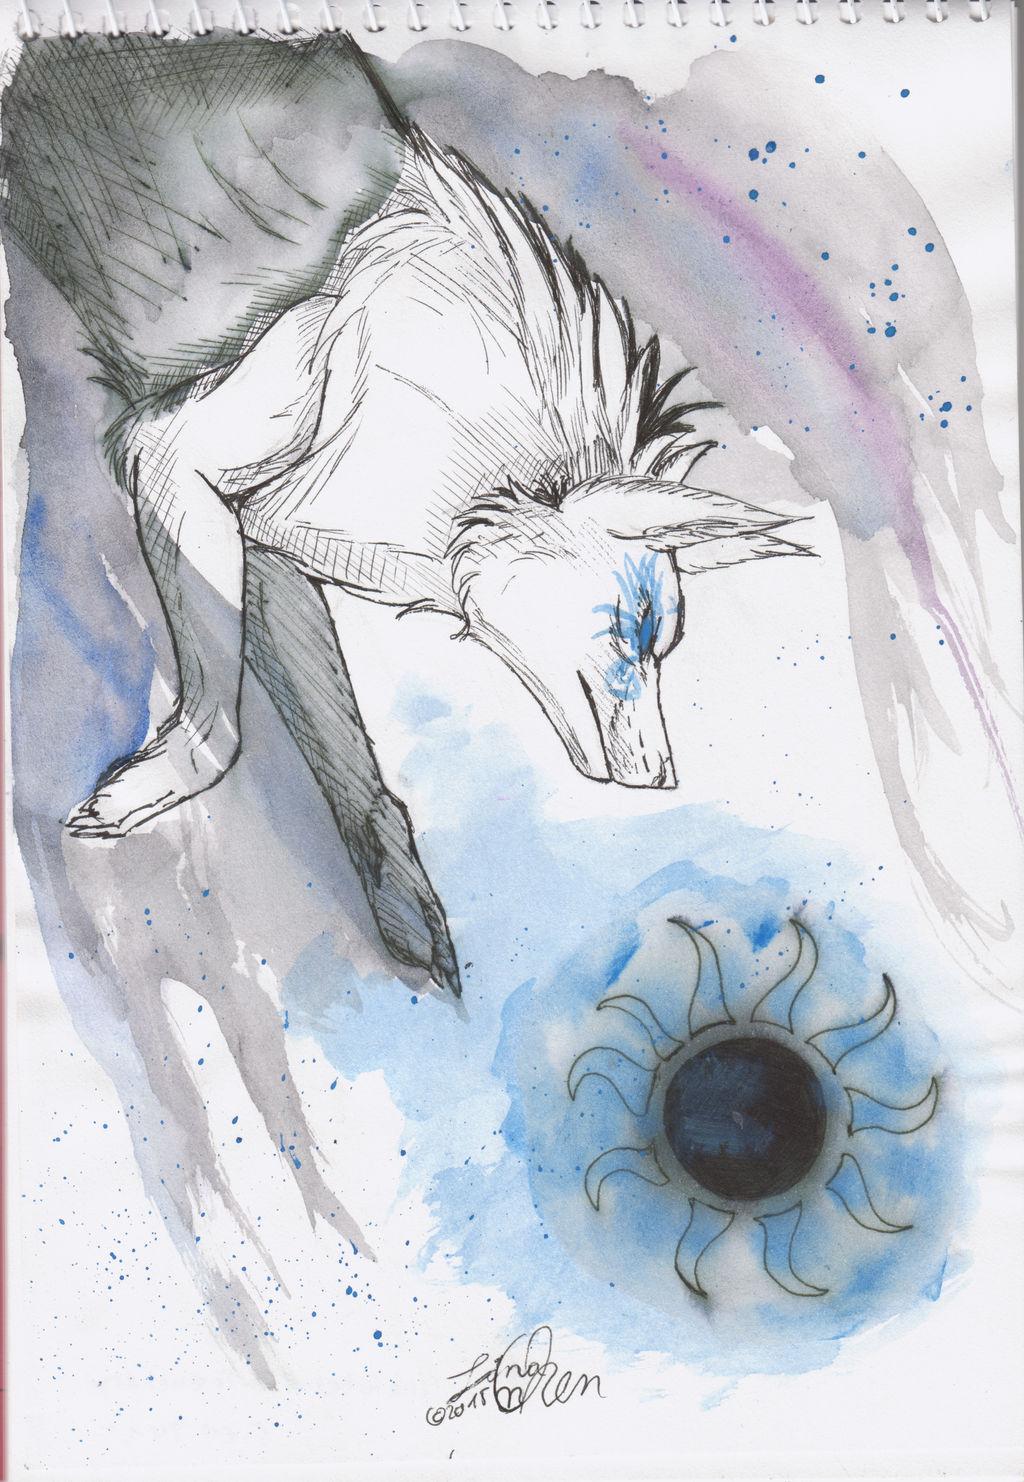 Inktober #5 - Treachery by Nychata